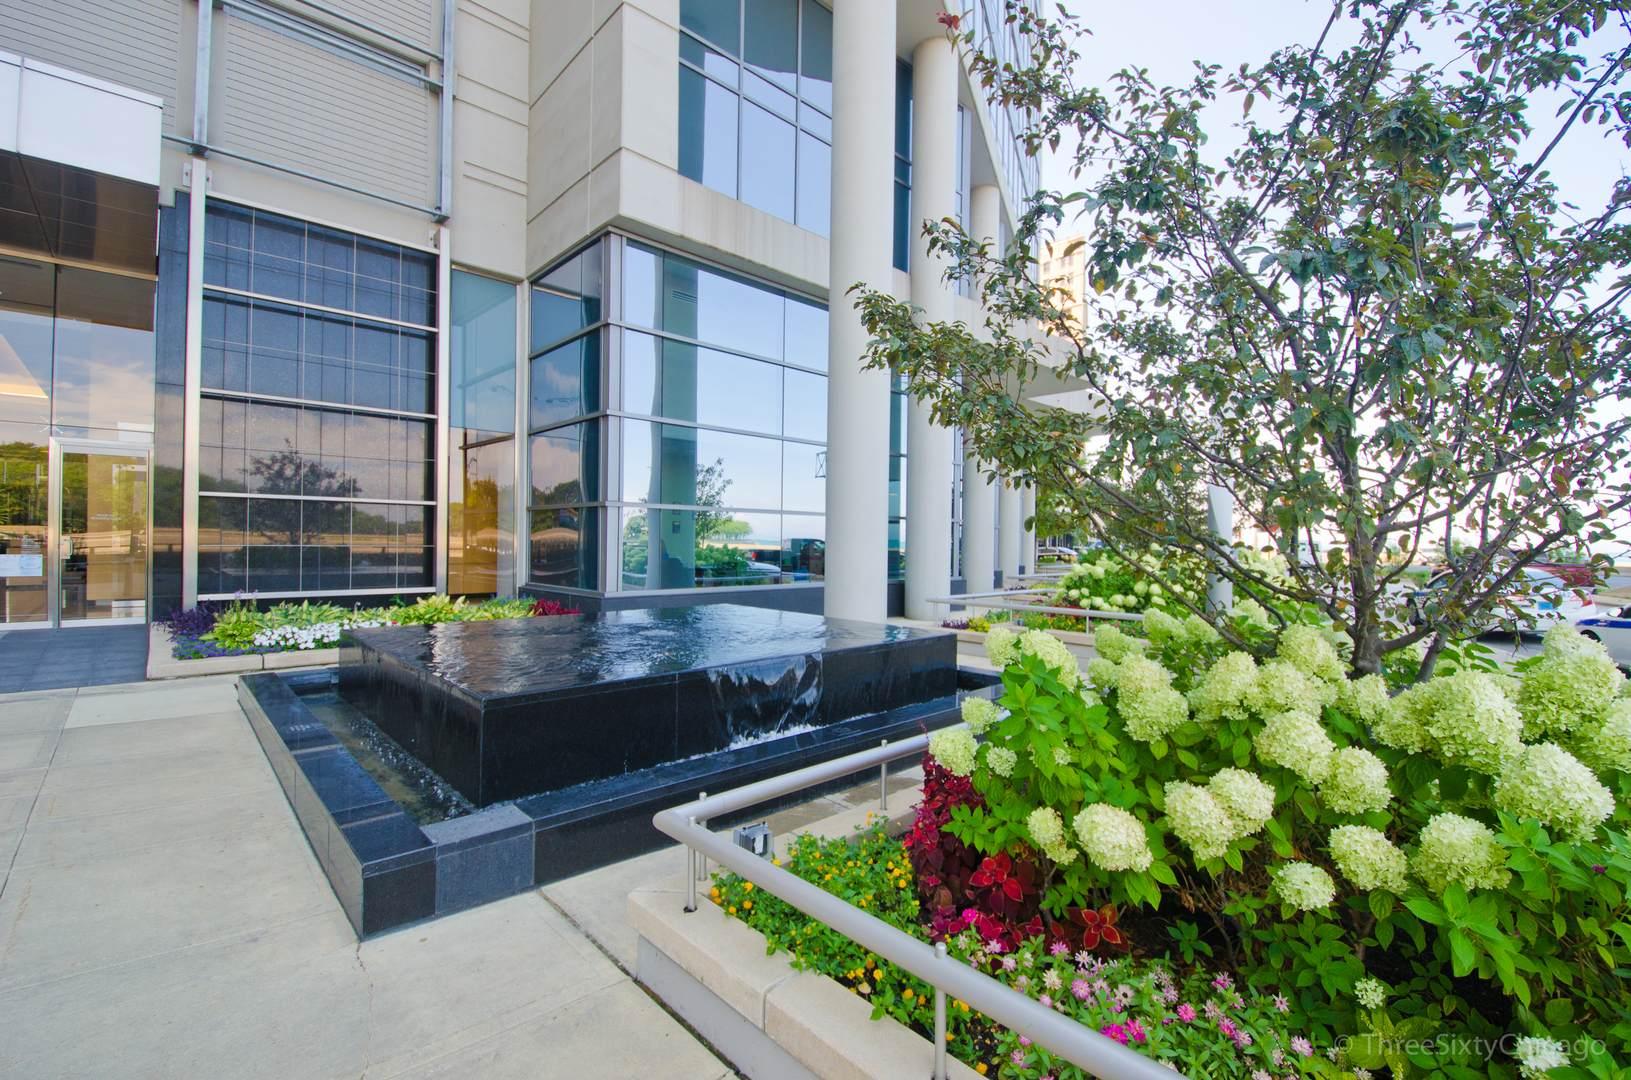 600 N Lake Shore Drive #3902, Chicago, IL 60611 (MLS #10730254) :: John Lyons Real Estate